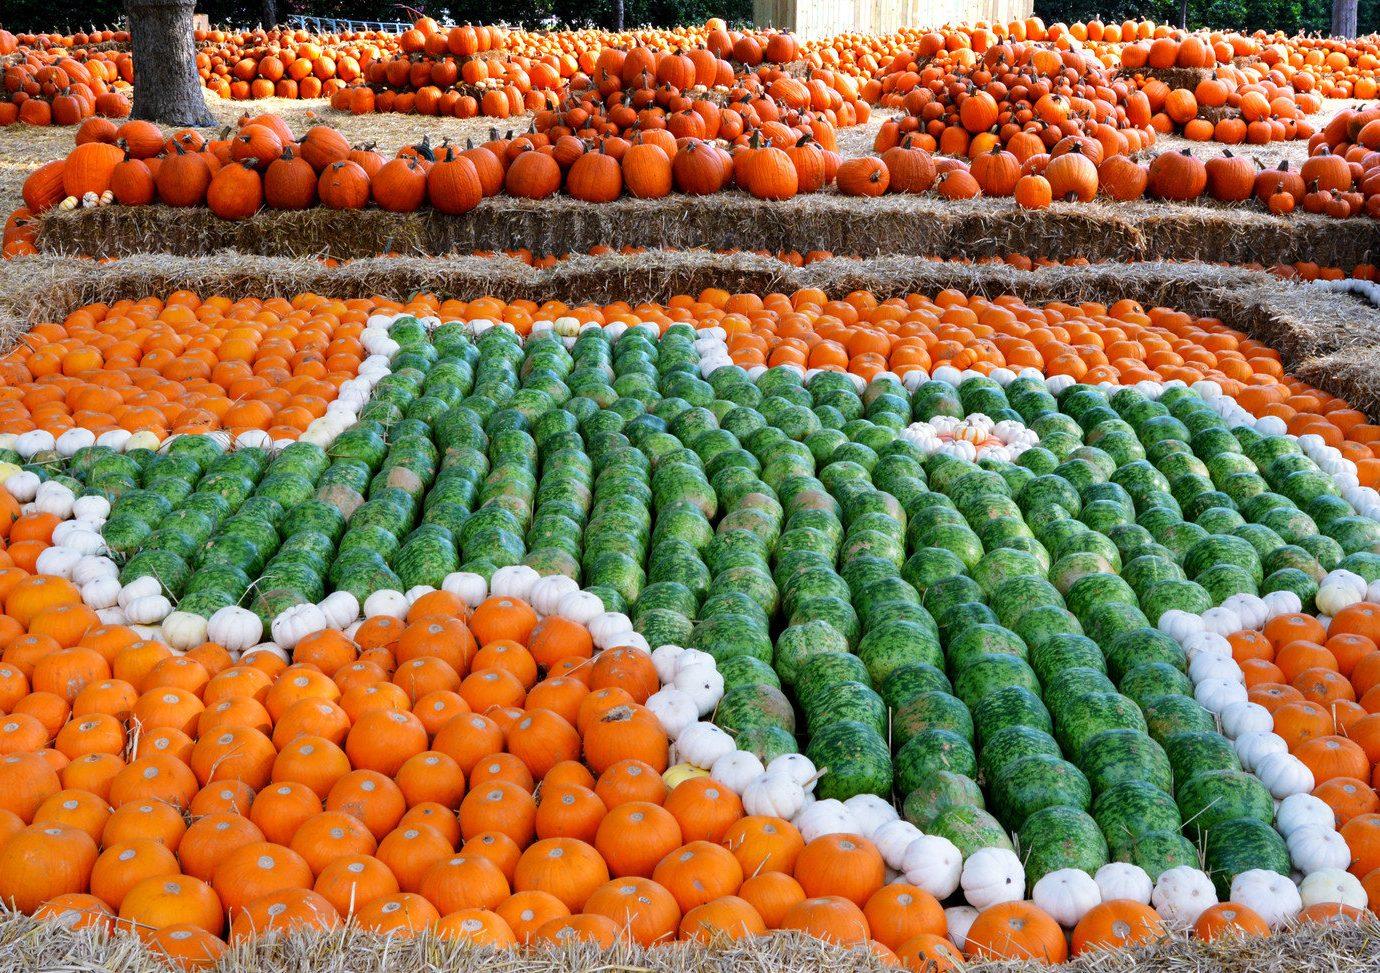 Trip Ideas City food public space produce human settlement orange vegetable greengrocer market flower pumpkin lined fresh